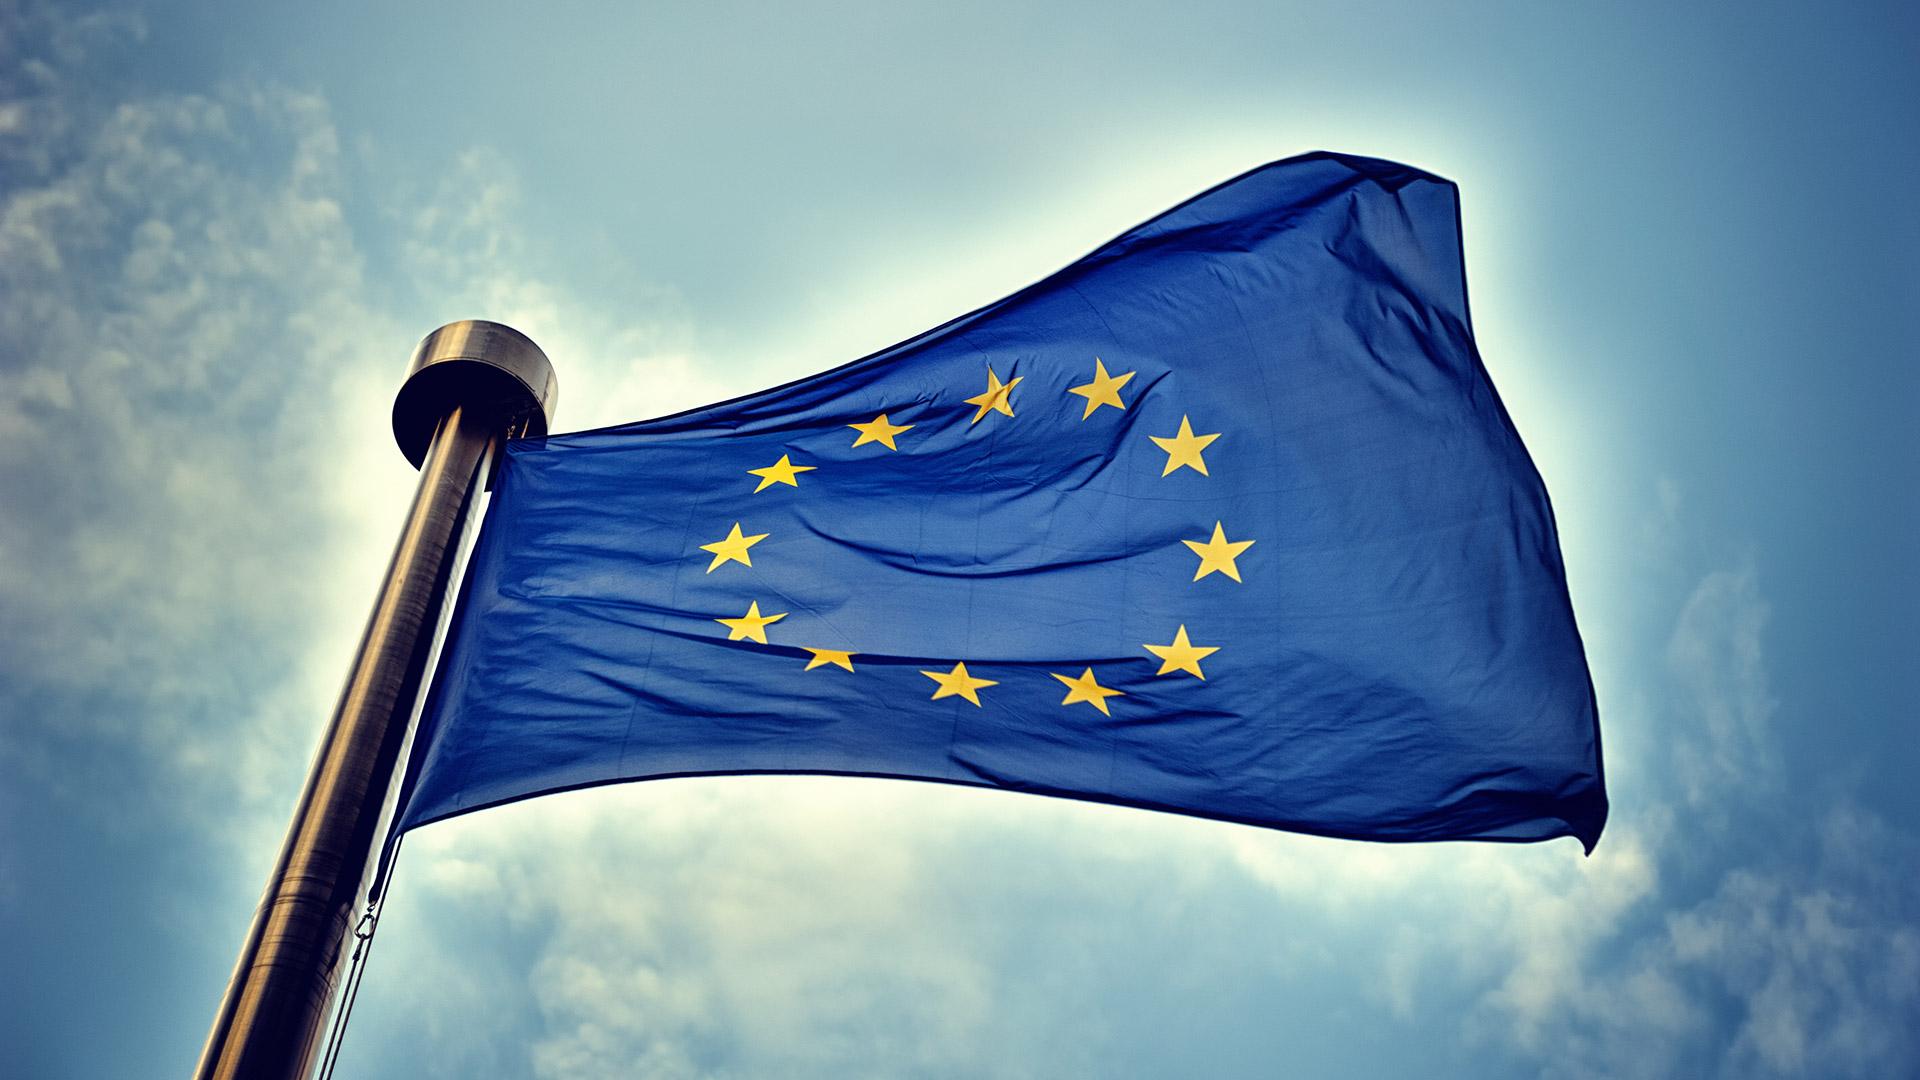 Photo to illustrate article https://www.lkshields.ie/images/uploads/news/eu-flag.jpg.